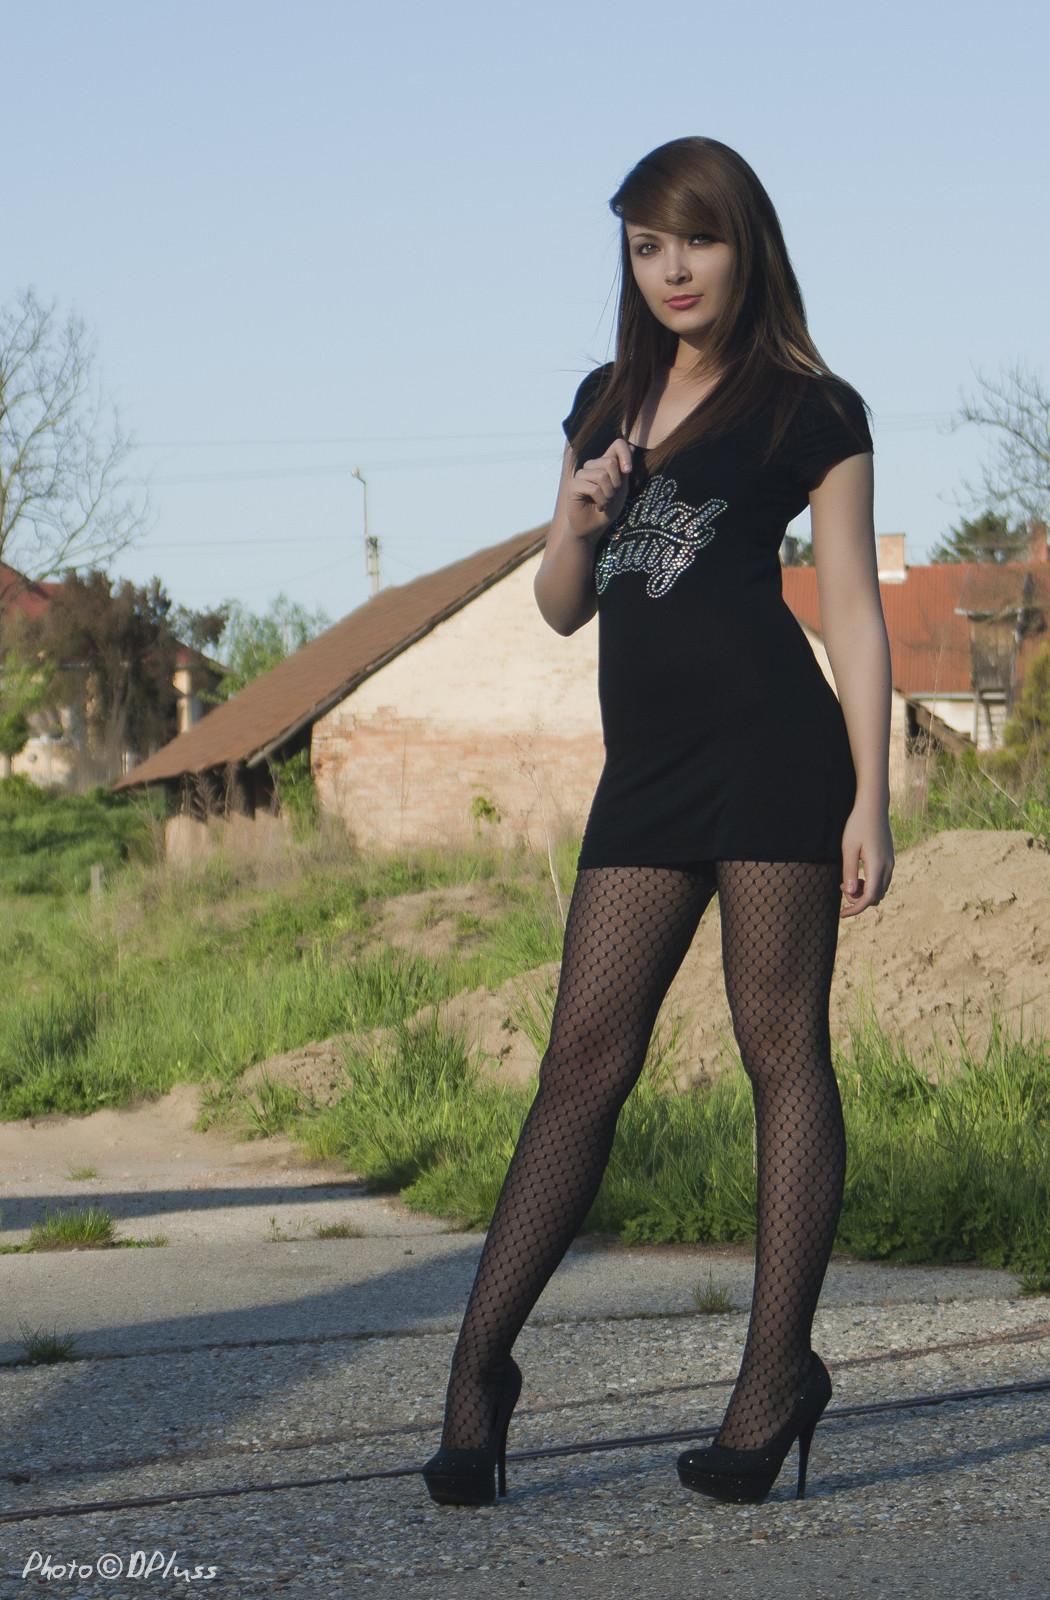 Free blackporn pics nsfw woman